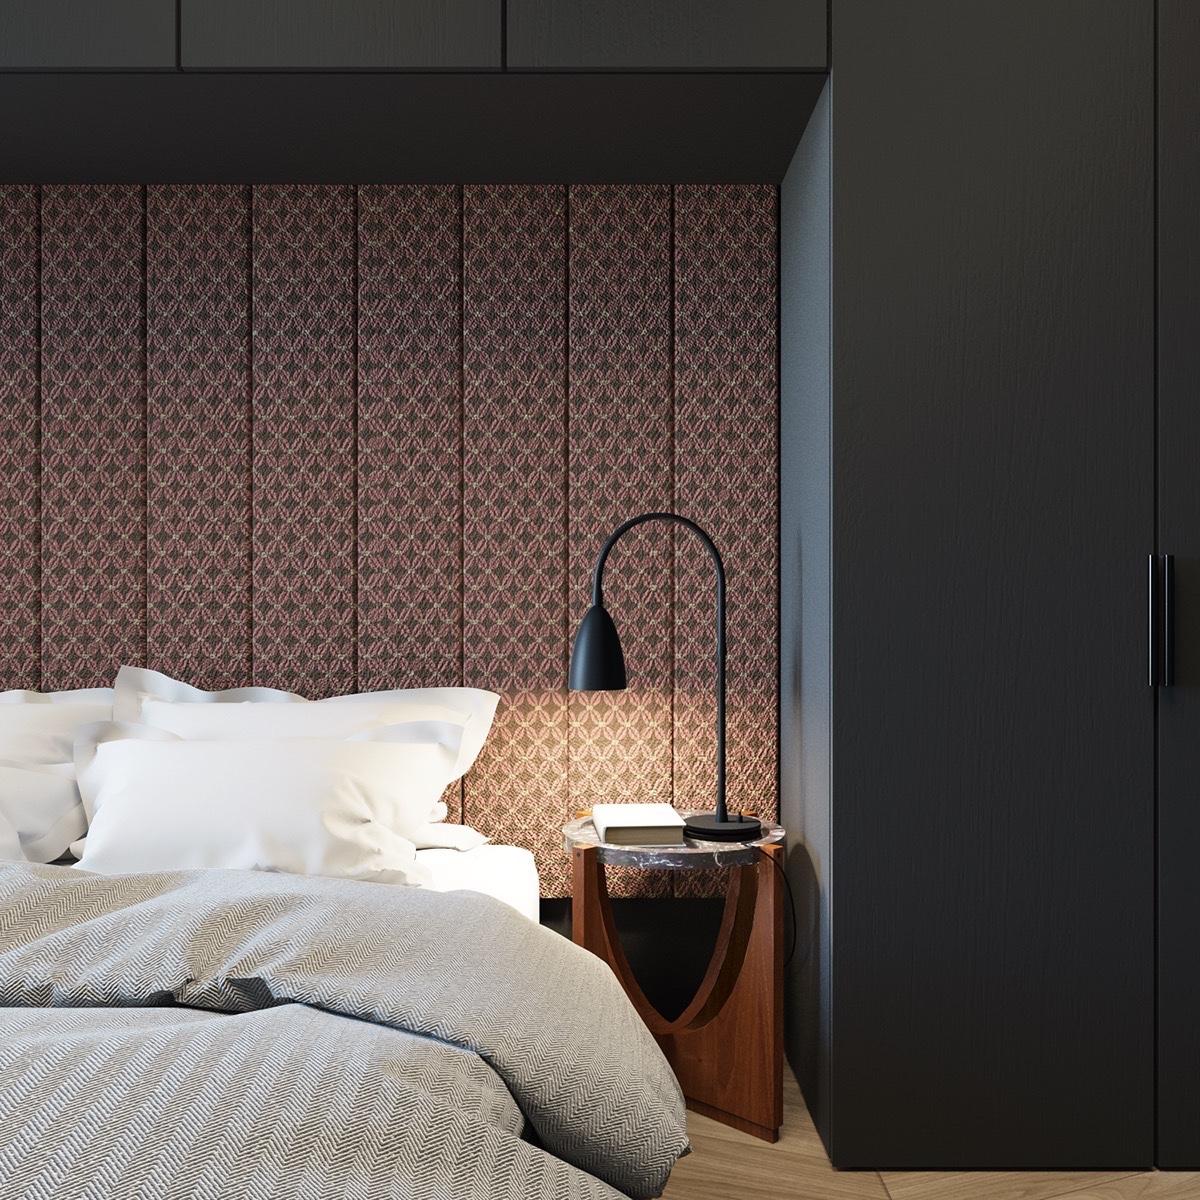 2 Bedroom Apartments In Las Vegas Under 600 Apartments under 600